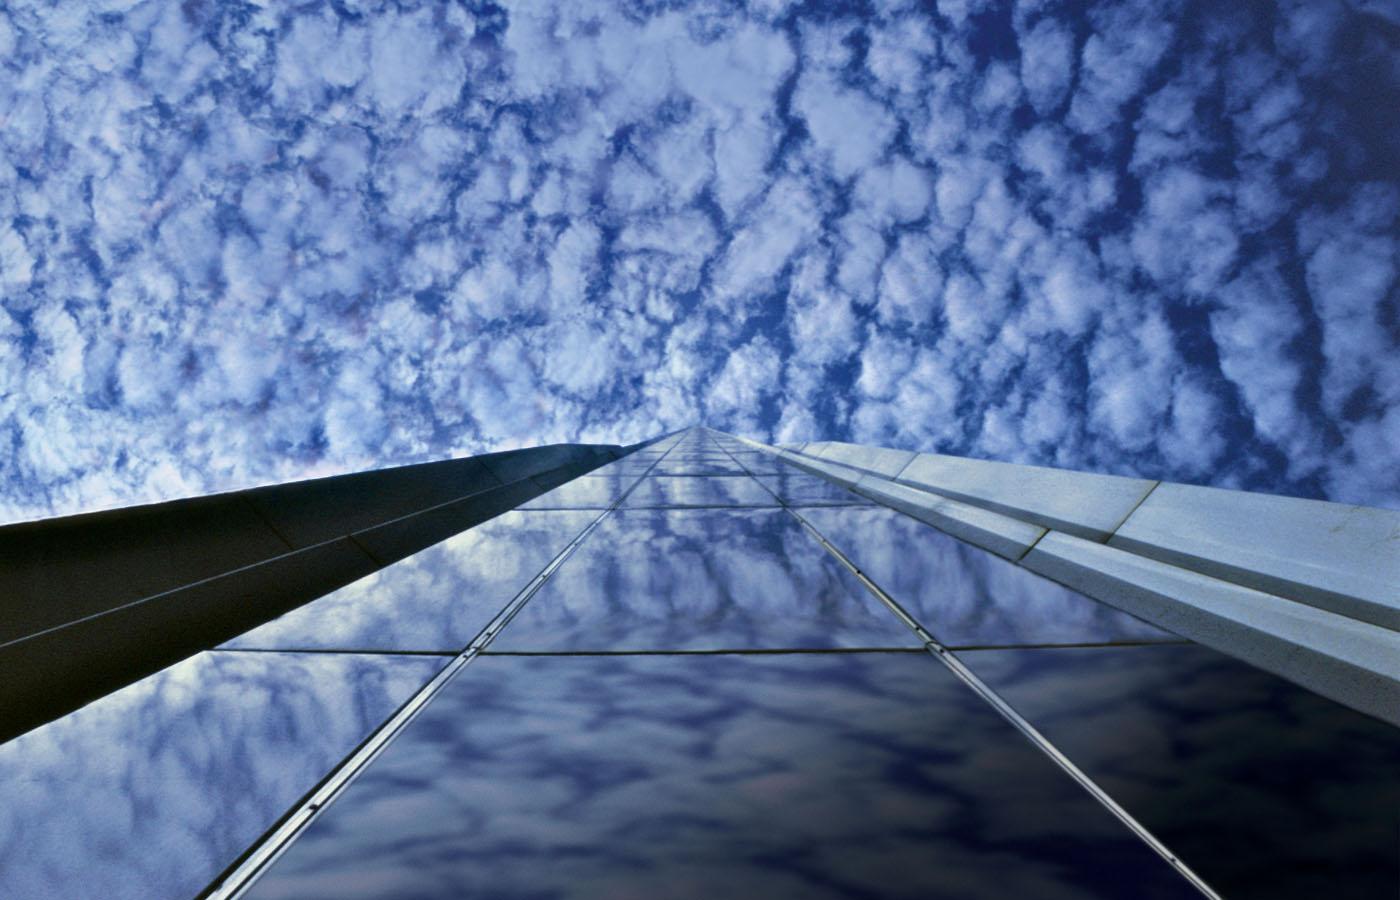 World Trade Center photograph by Charles Moretz